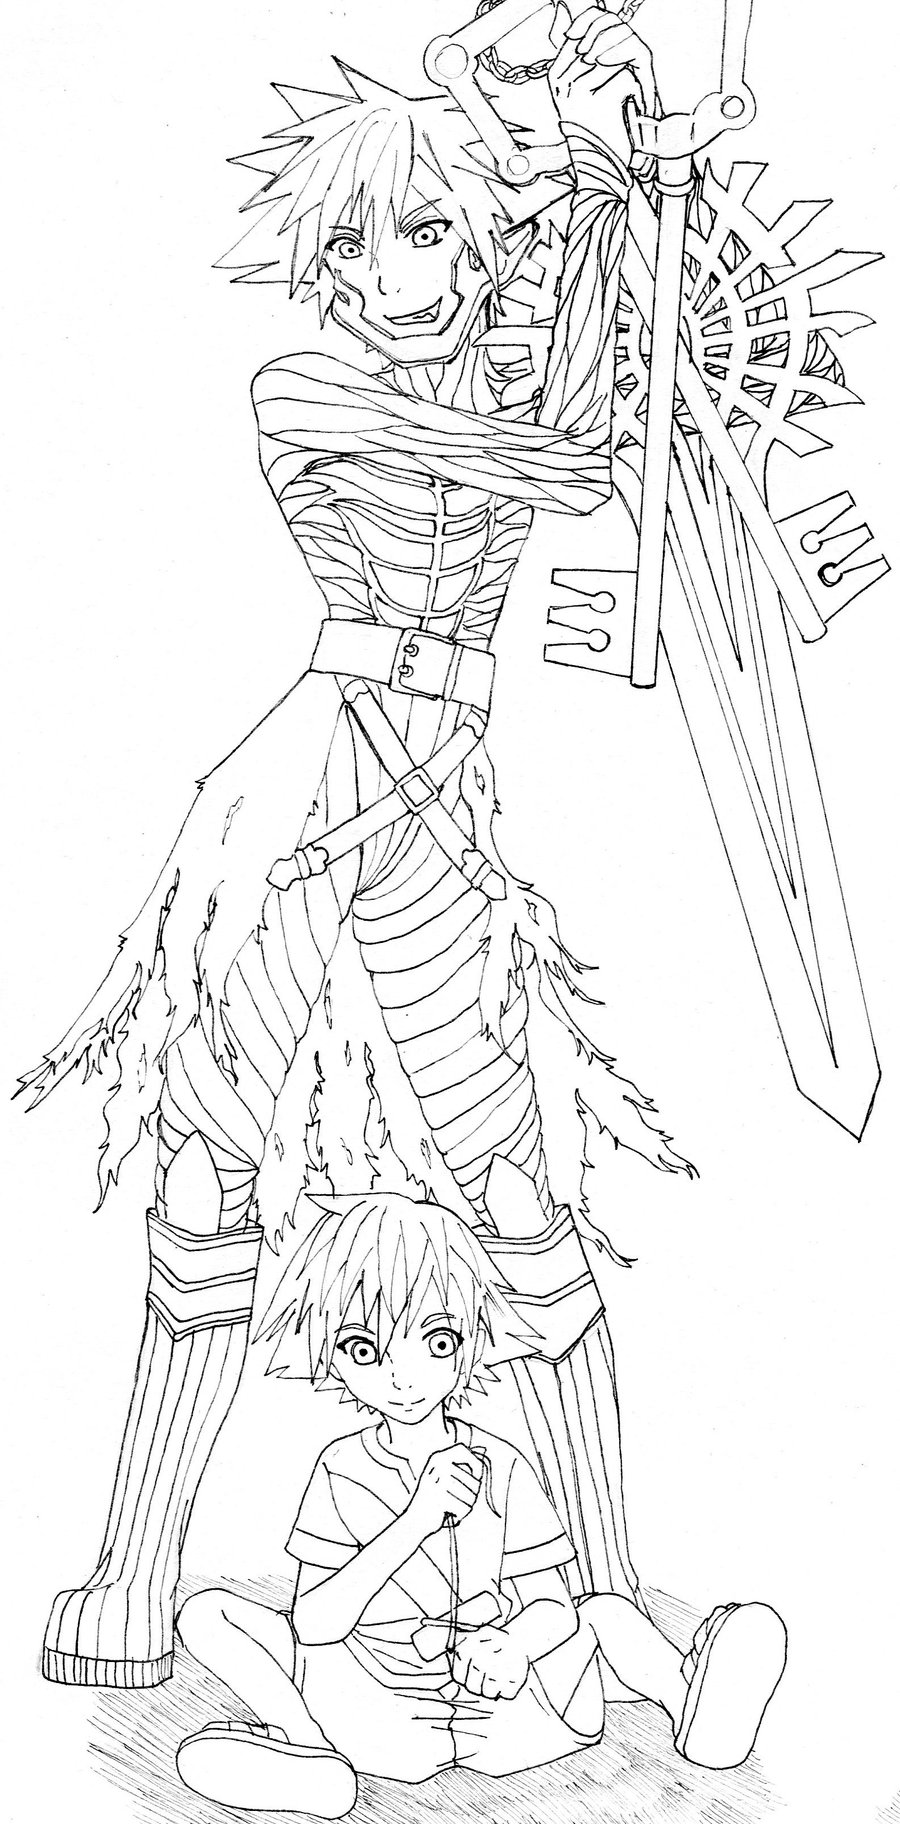 Sora Kingdom Hearts Lineart : Vanitas and sora lineart by reiwonderland on deviantart